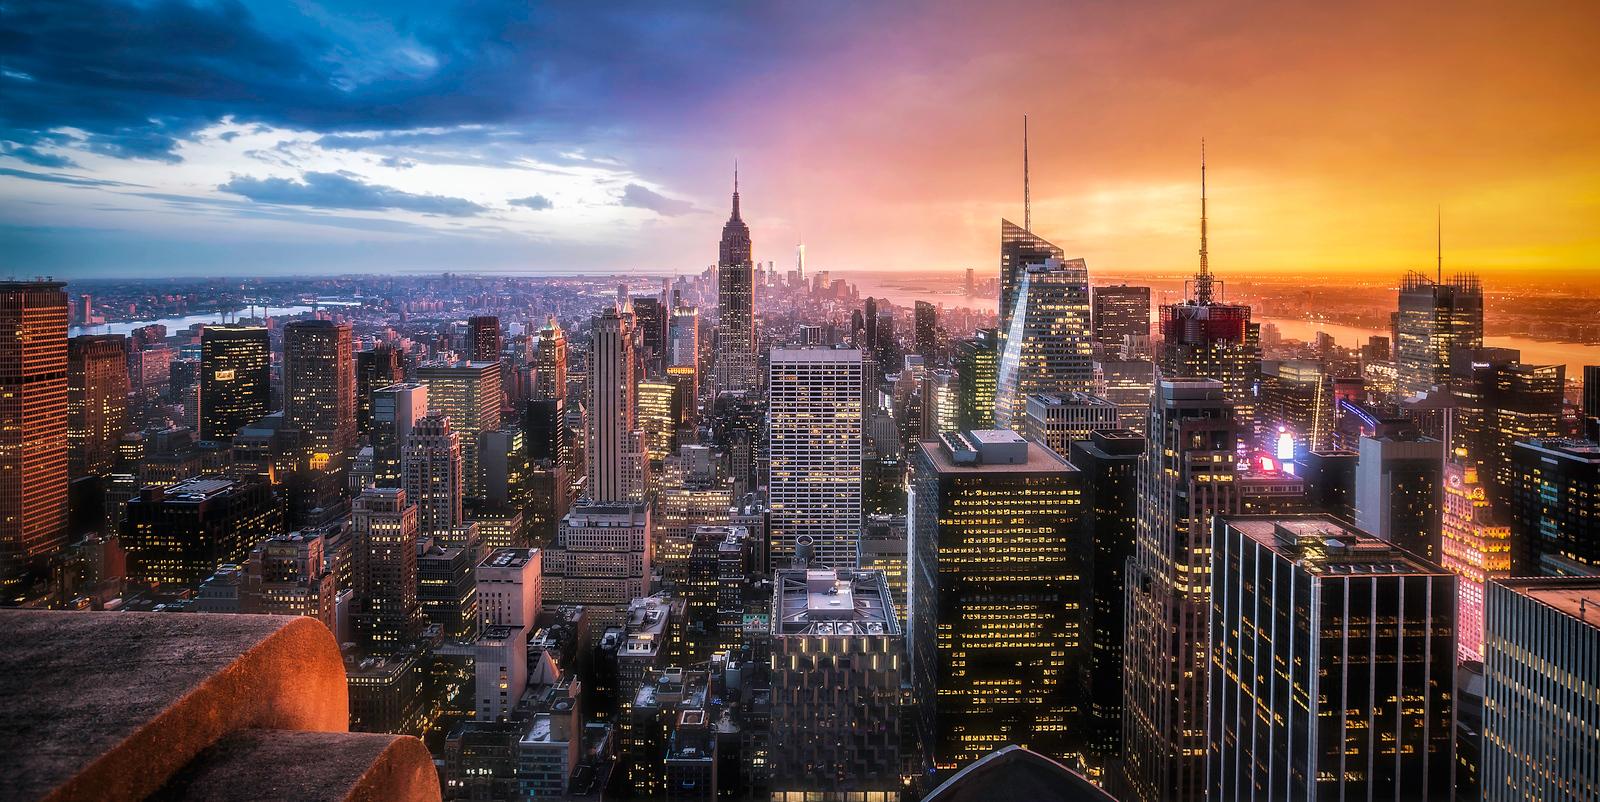 Day vs Night New York City